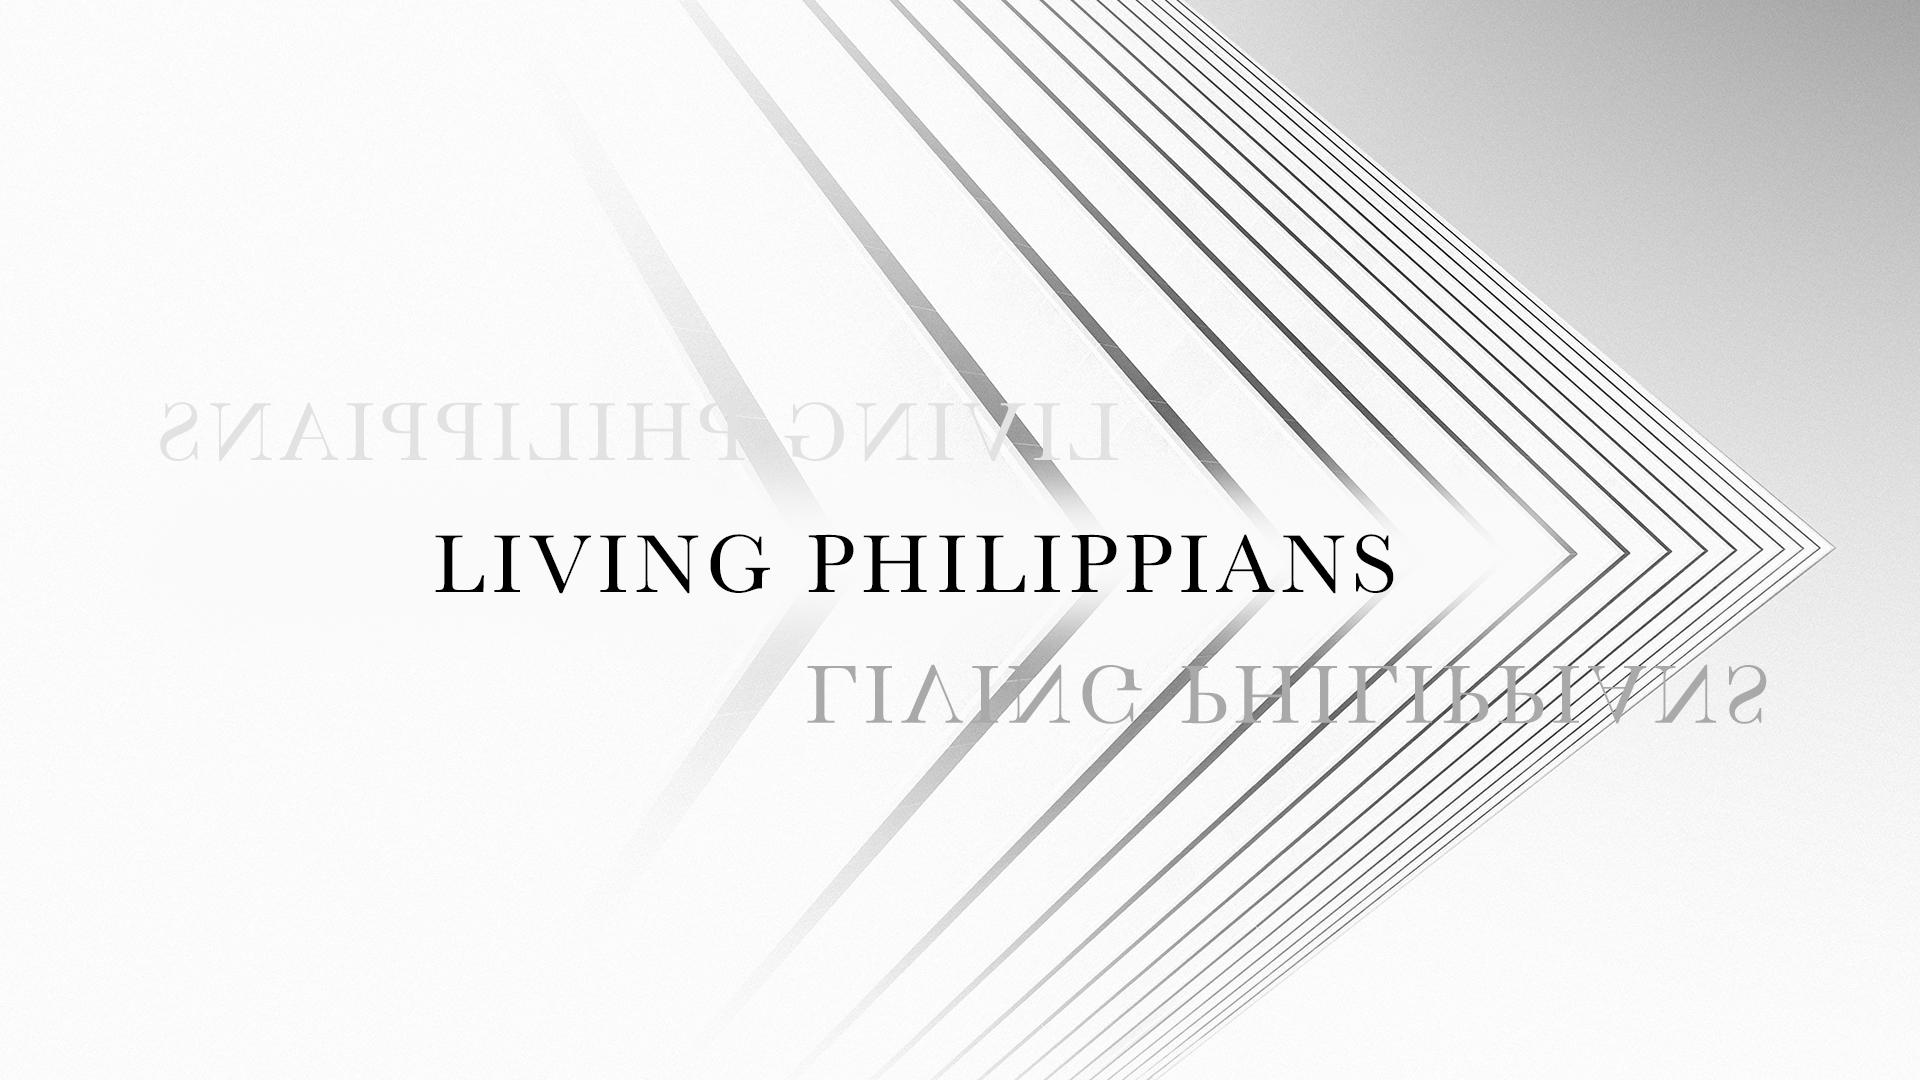 philippi_series.jpg